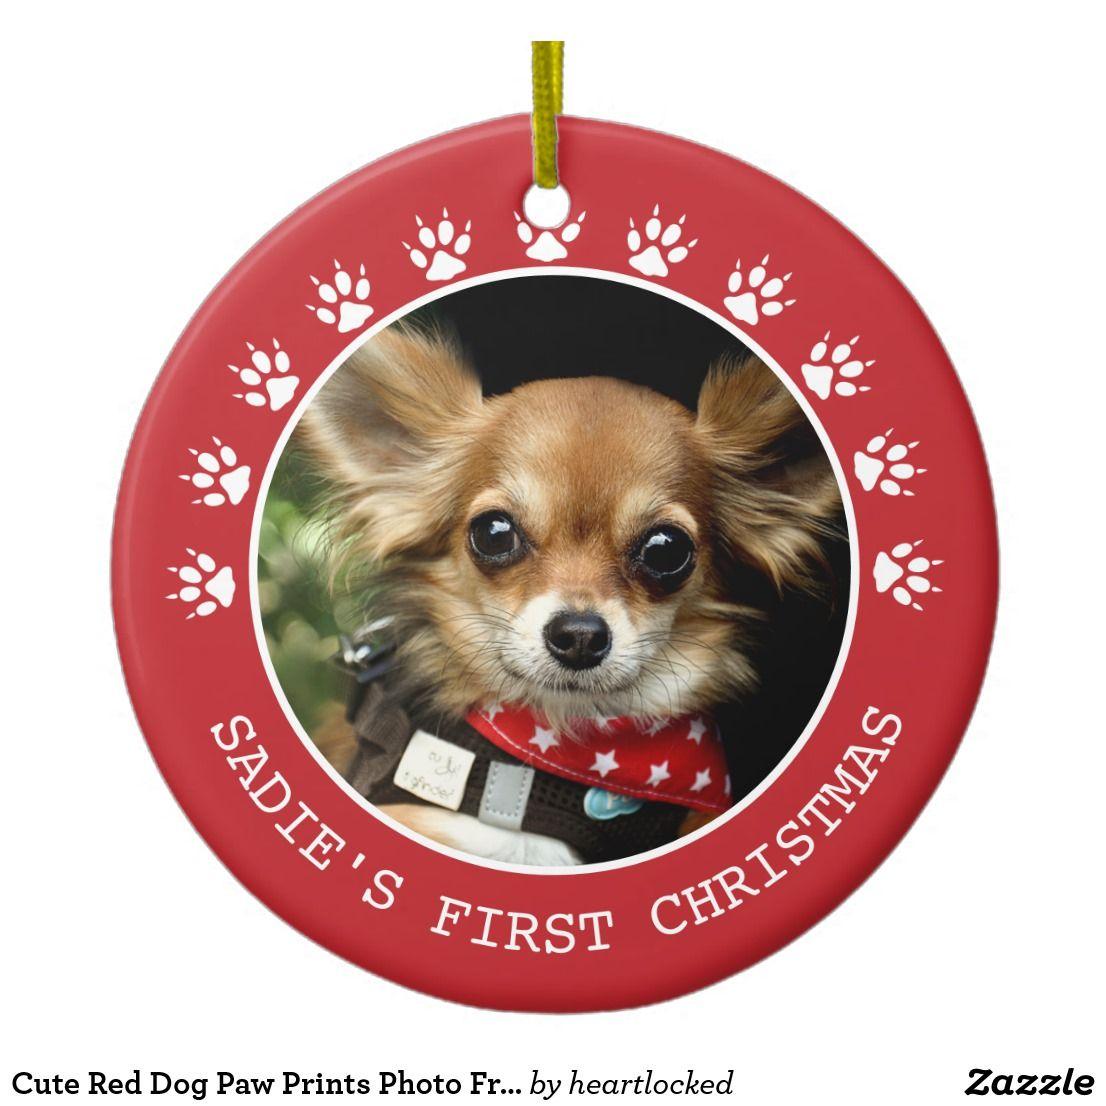 Cute Red Dog Paw Prints Photo Frame Christmas Ceramic